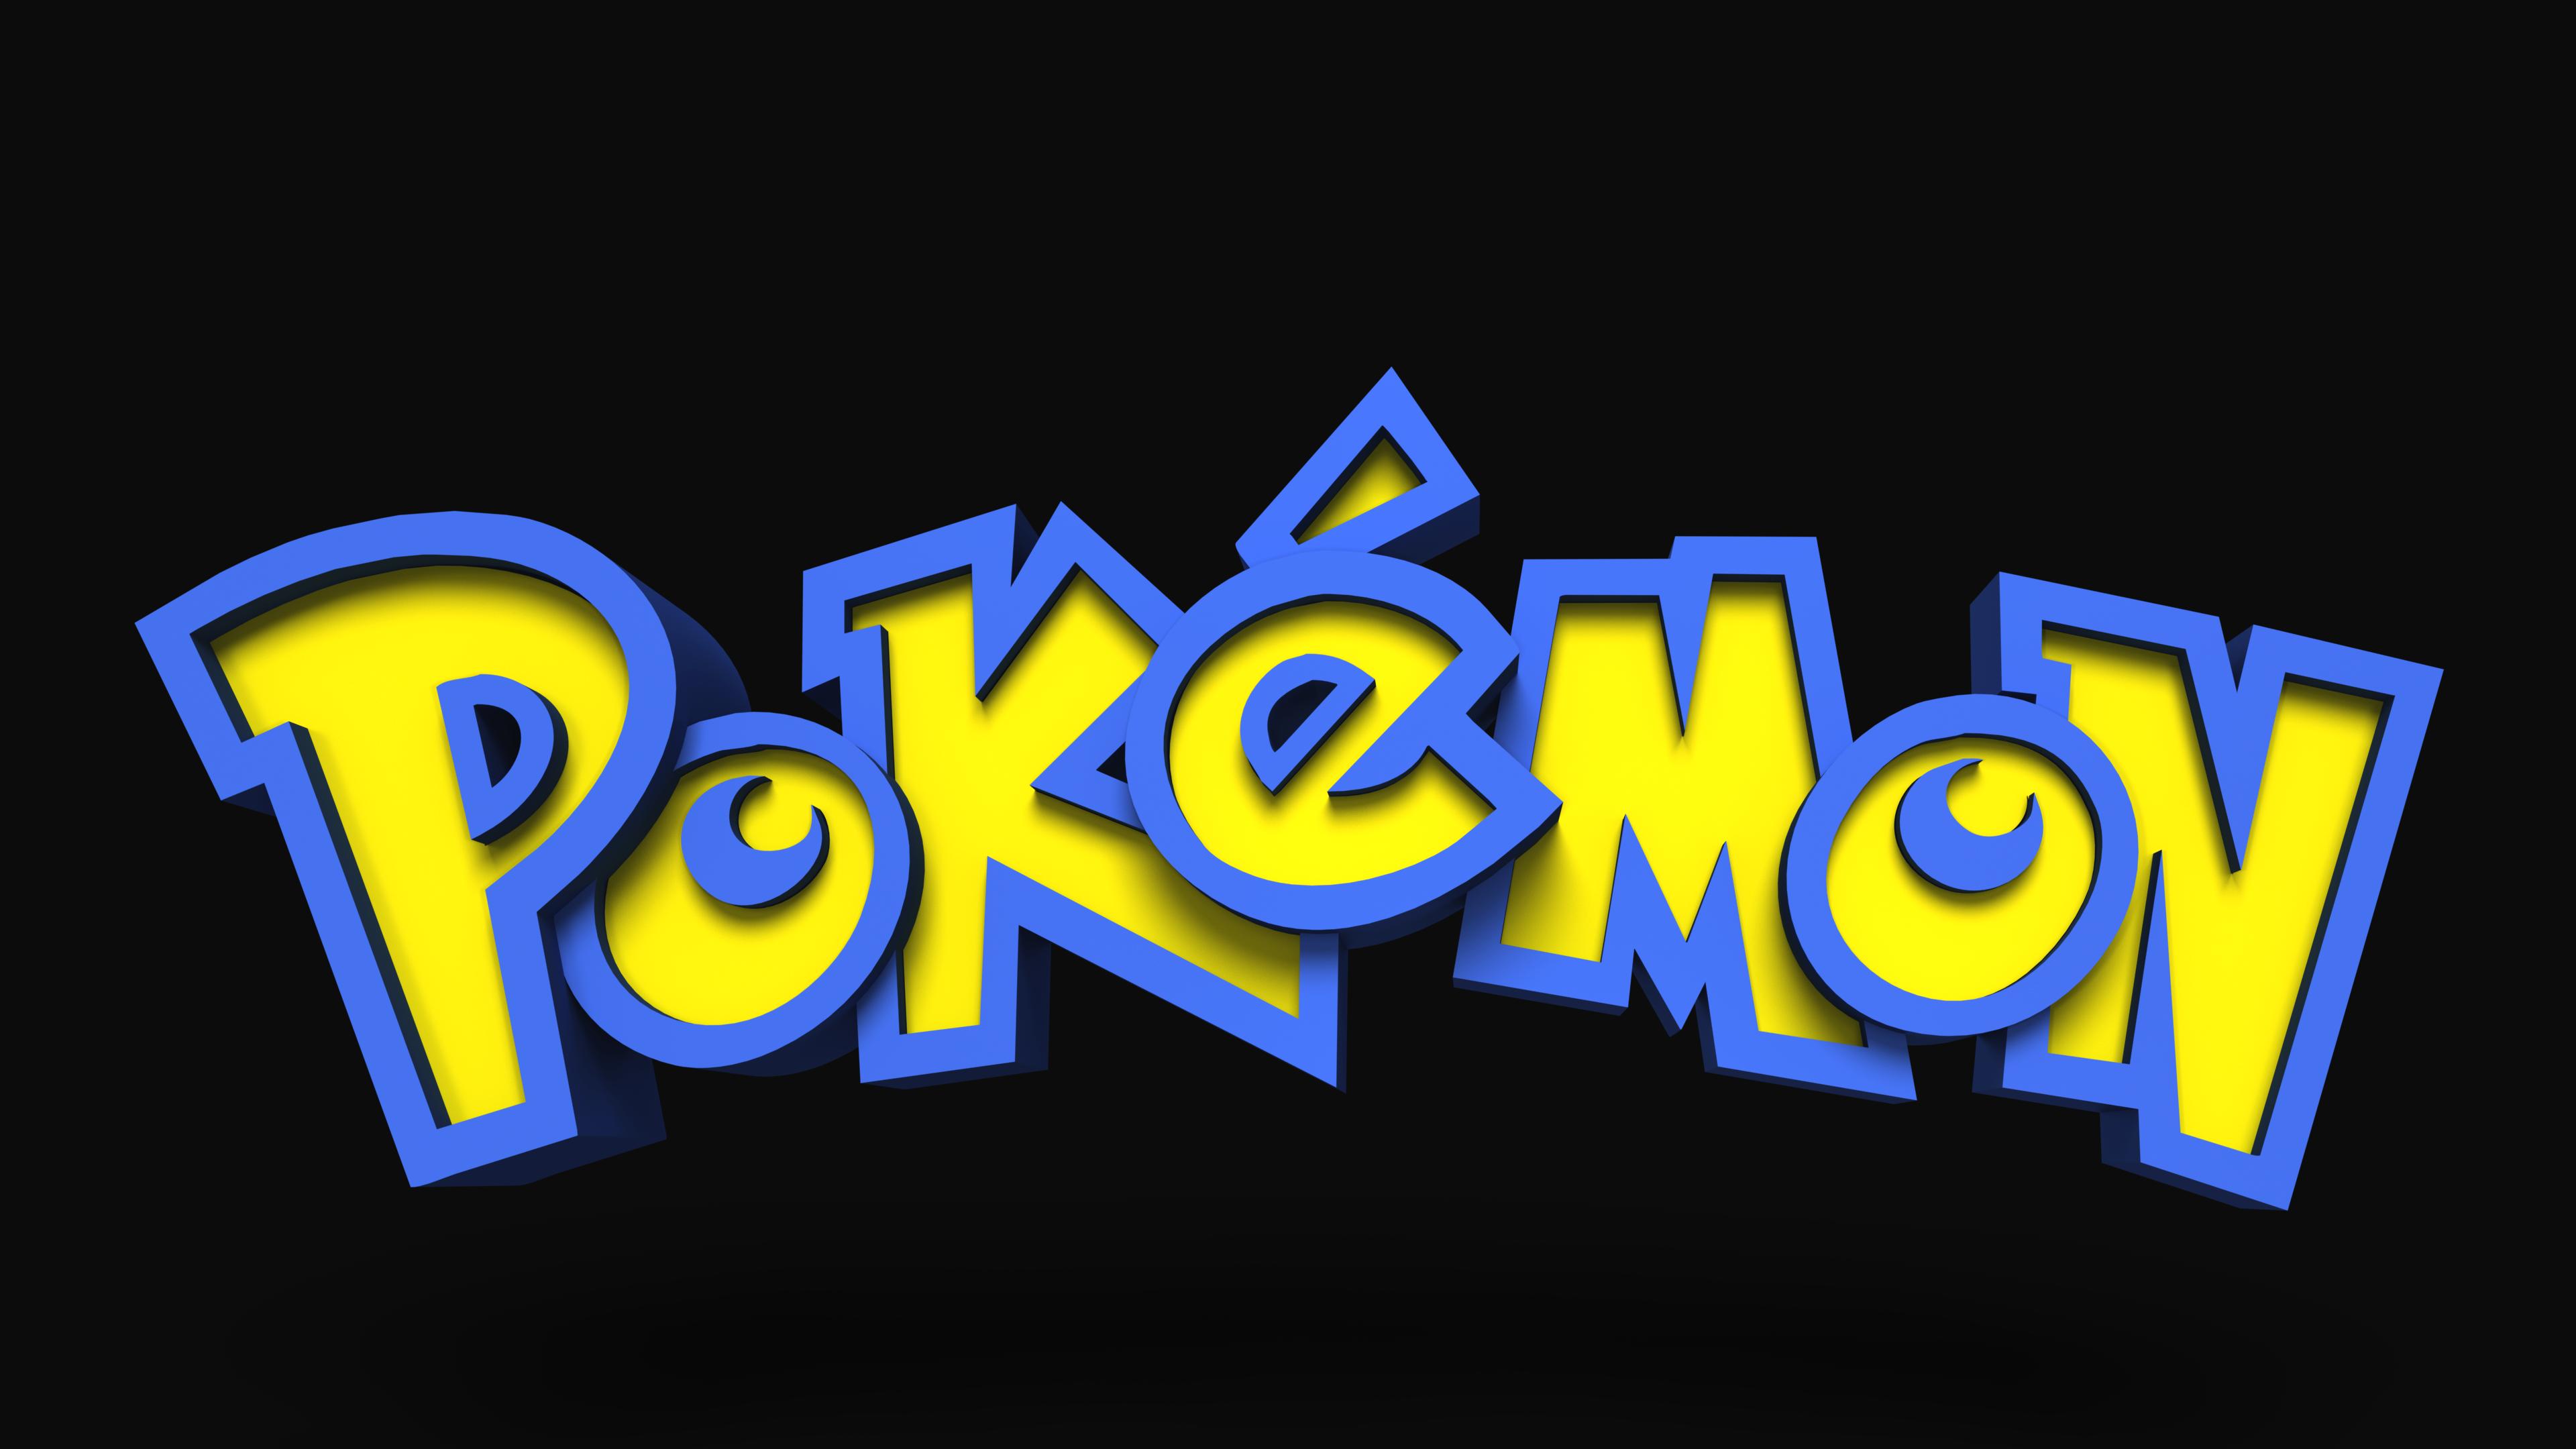 Oc I Rendered The Pokemon Logo In 3d Using Only Photoshop Pokemon Logo Pokemon Theme Pokemon